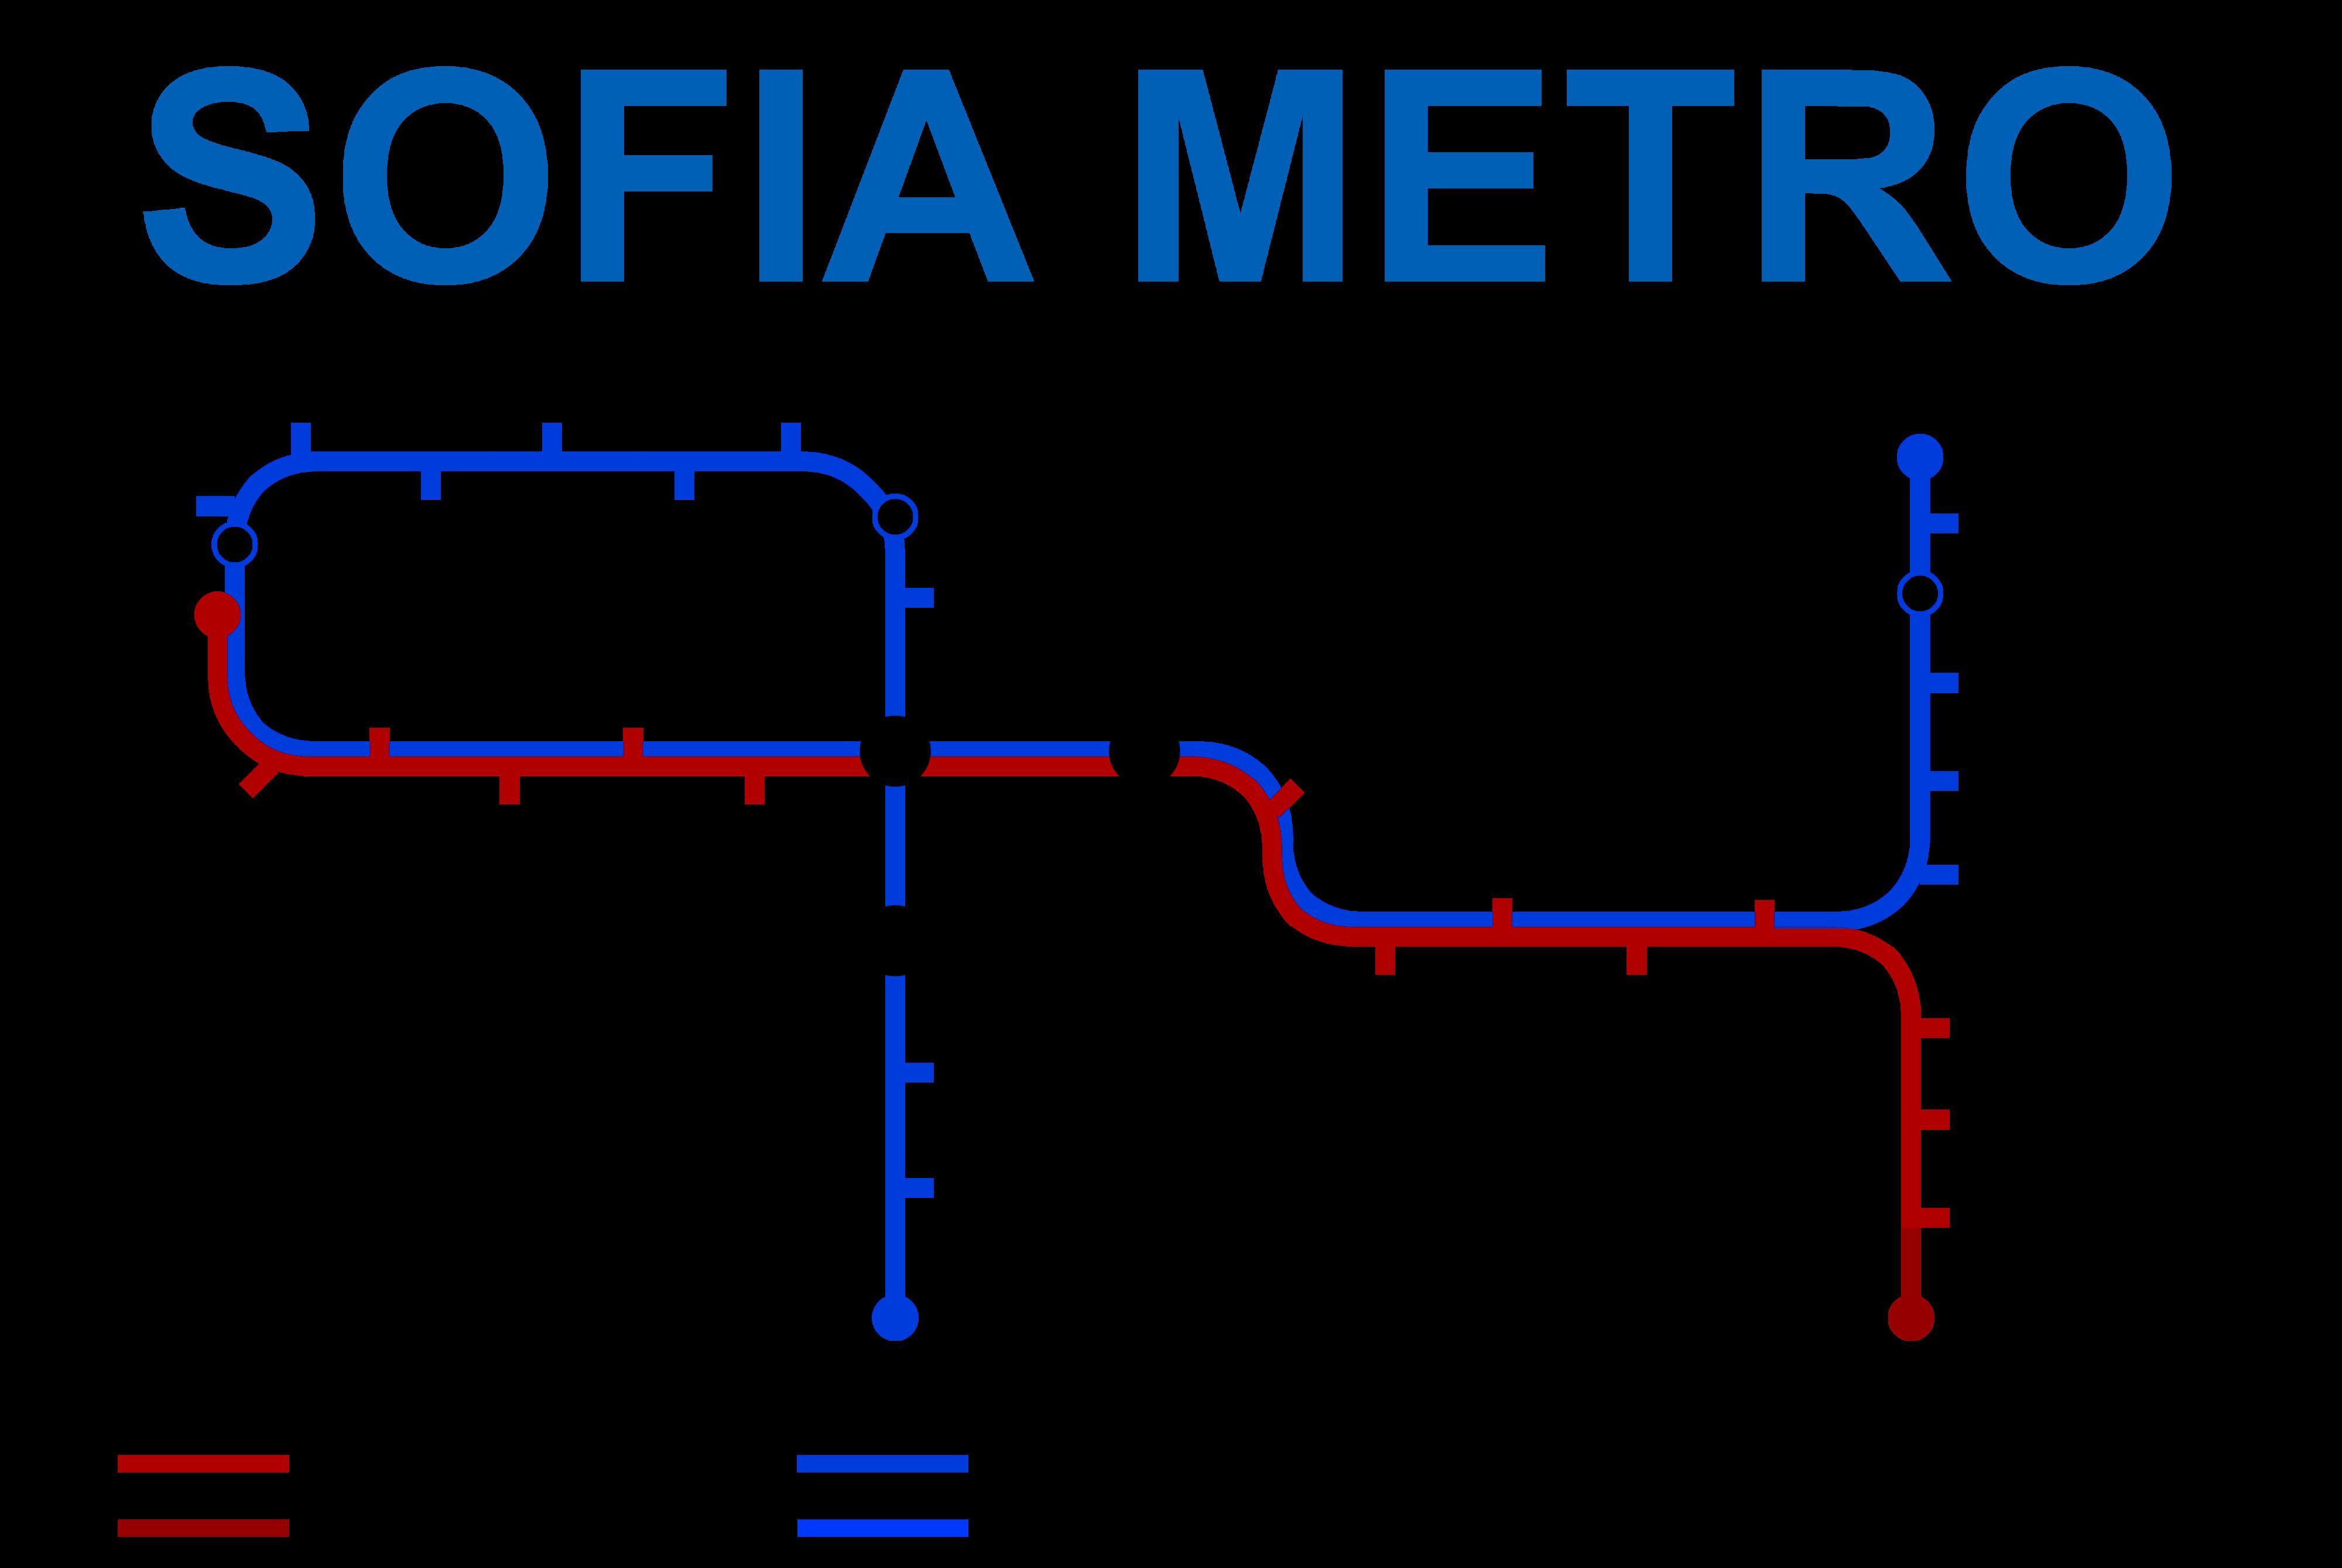 Sofia Metro Sofya metro